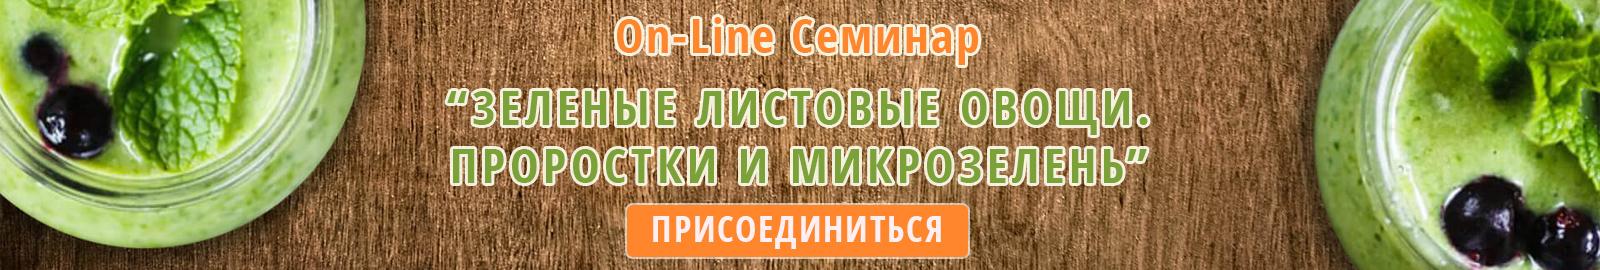 On Line Seminar